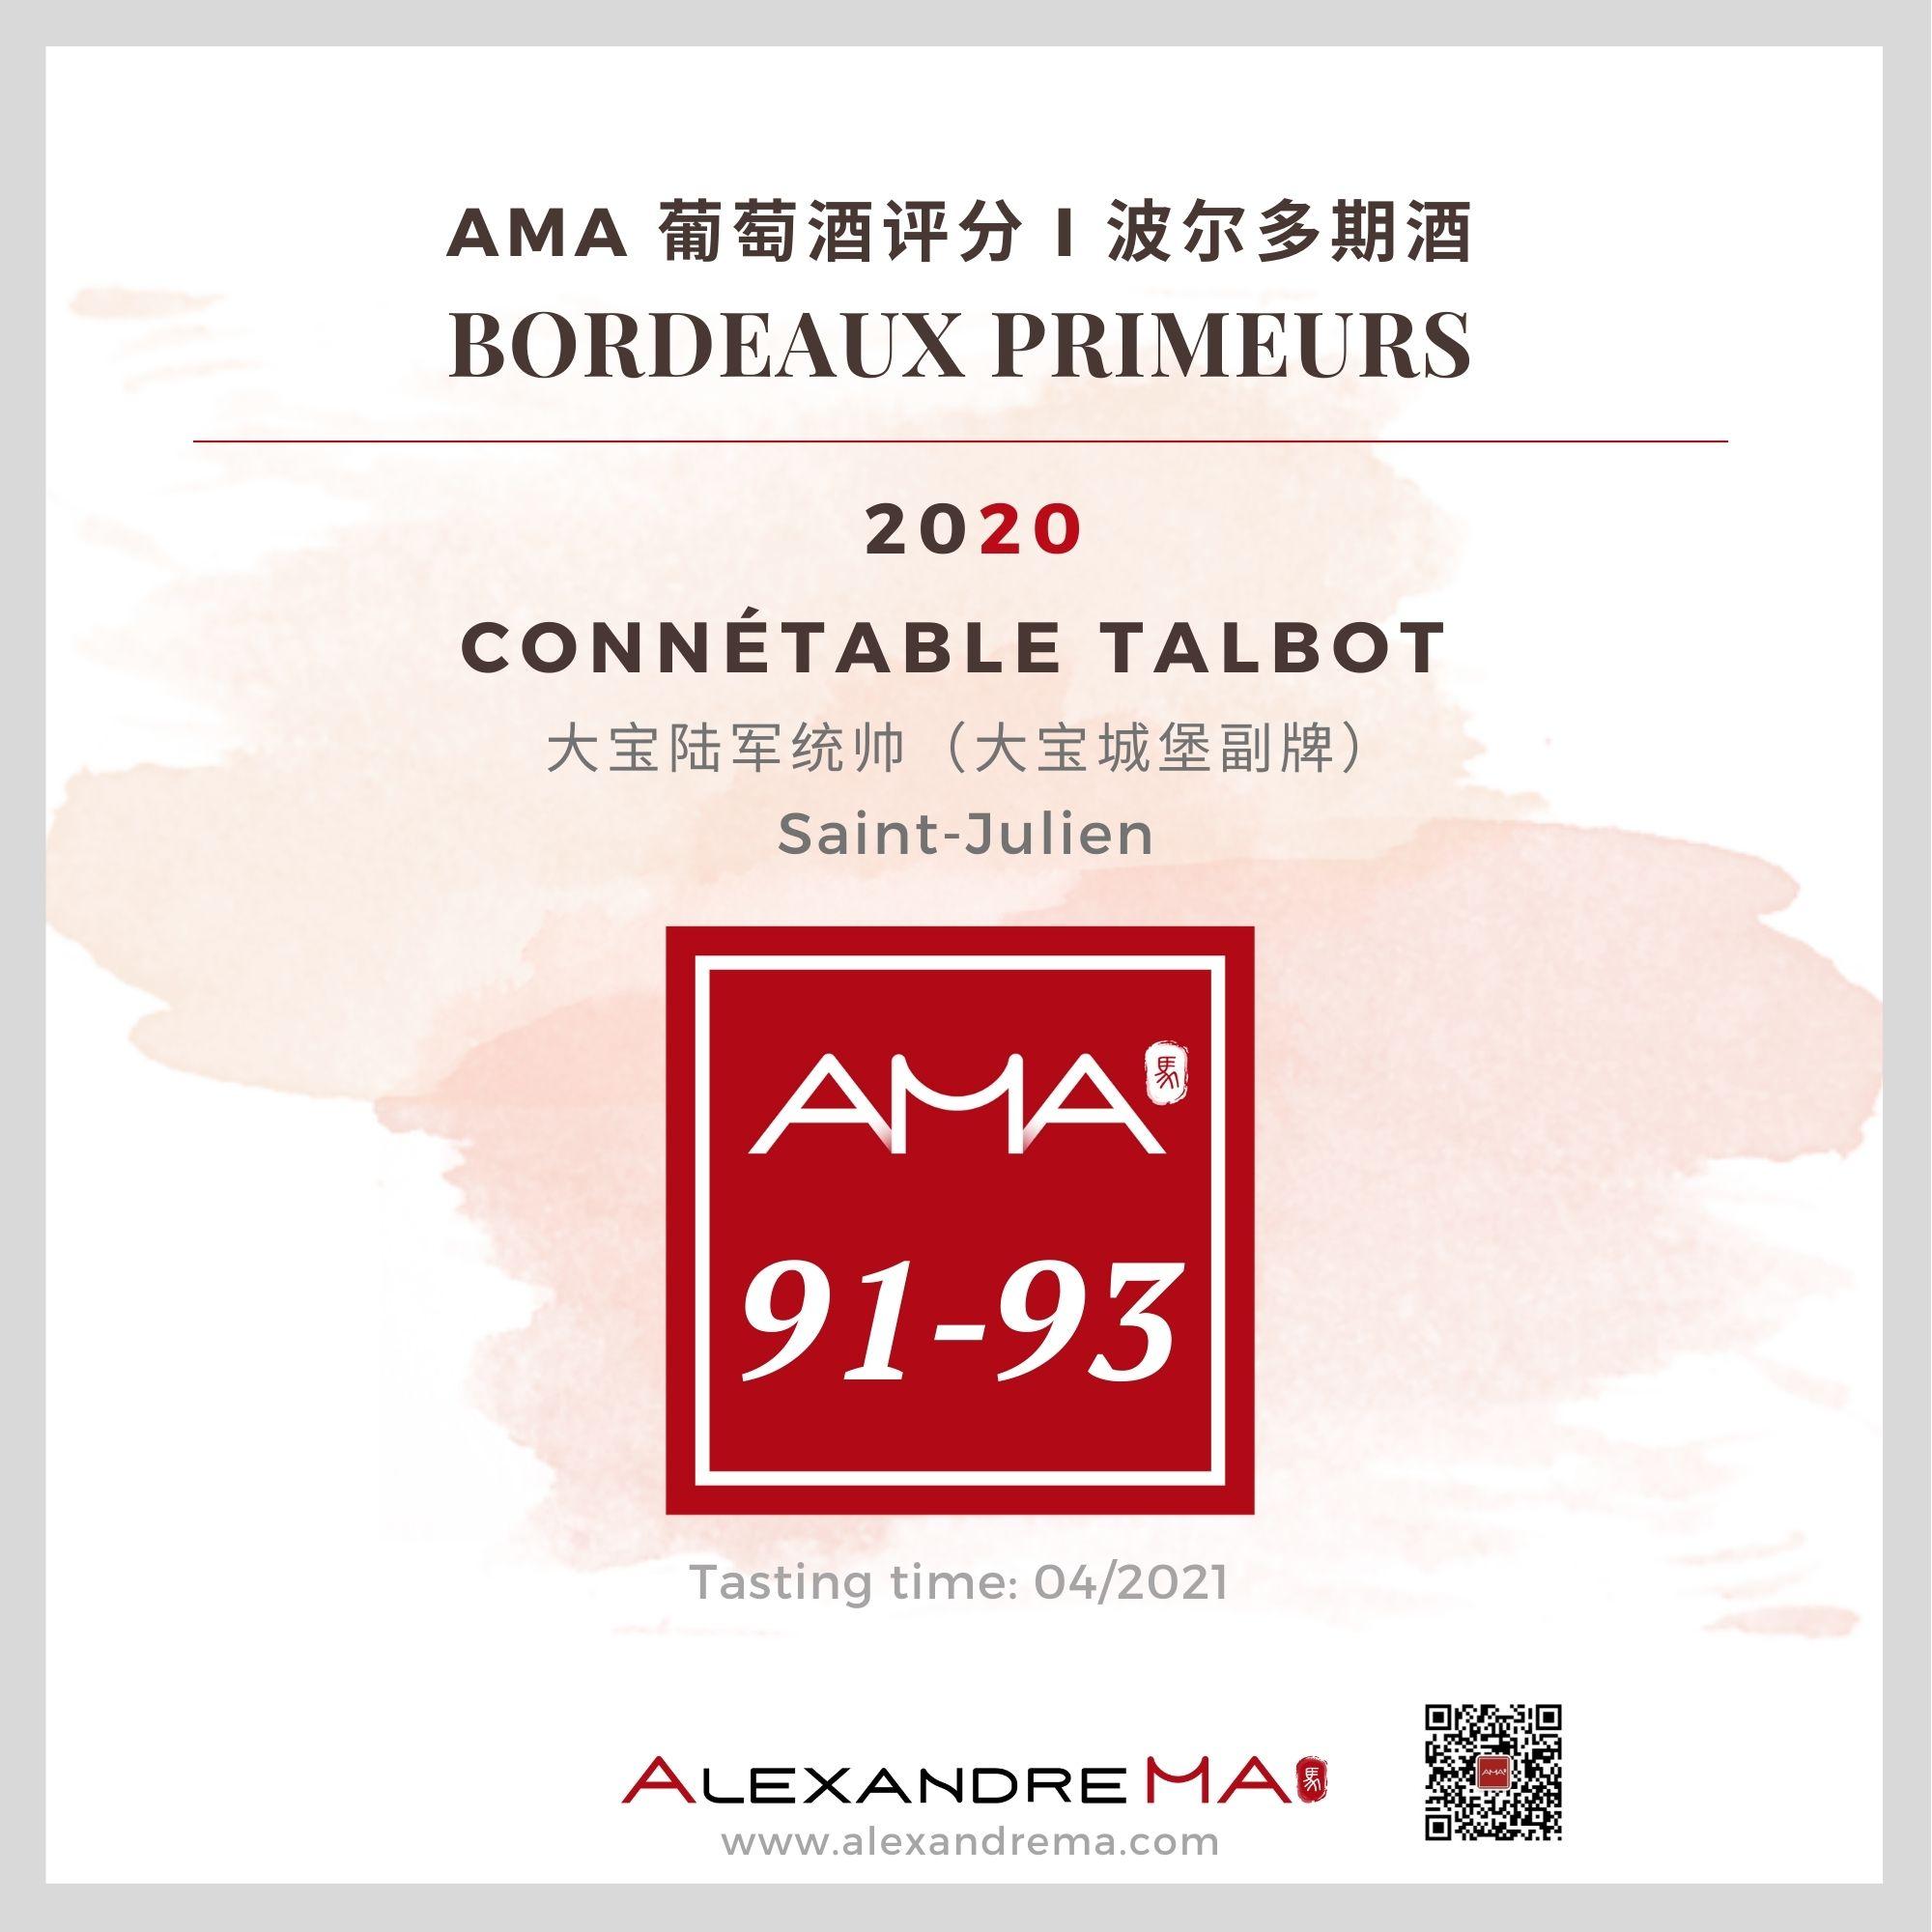 Château Talbot – Connétable Talbot – Red – 2020 – CN - Alexandre Ma